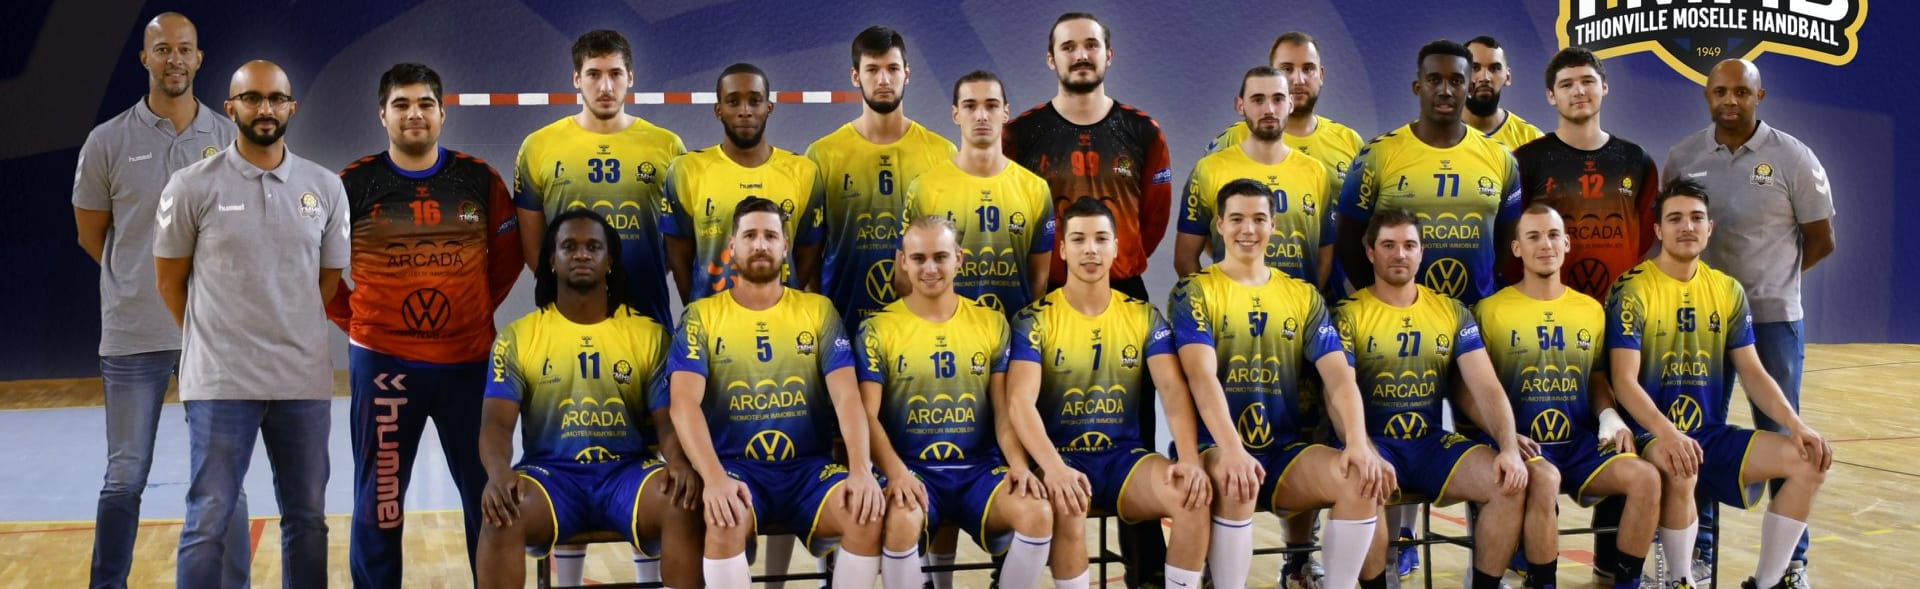 Thionville Moselle Handball